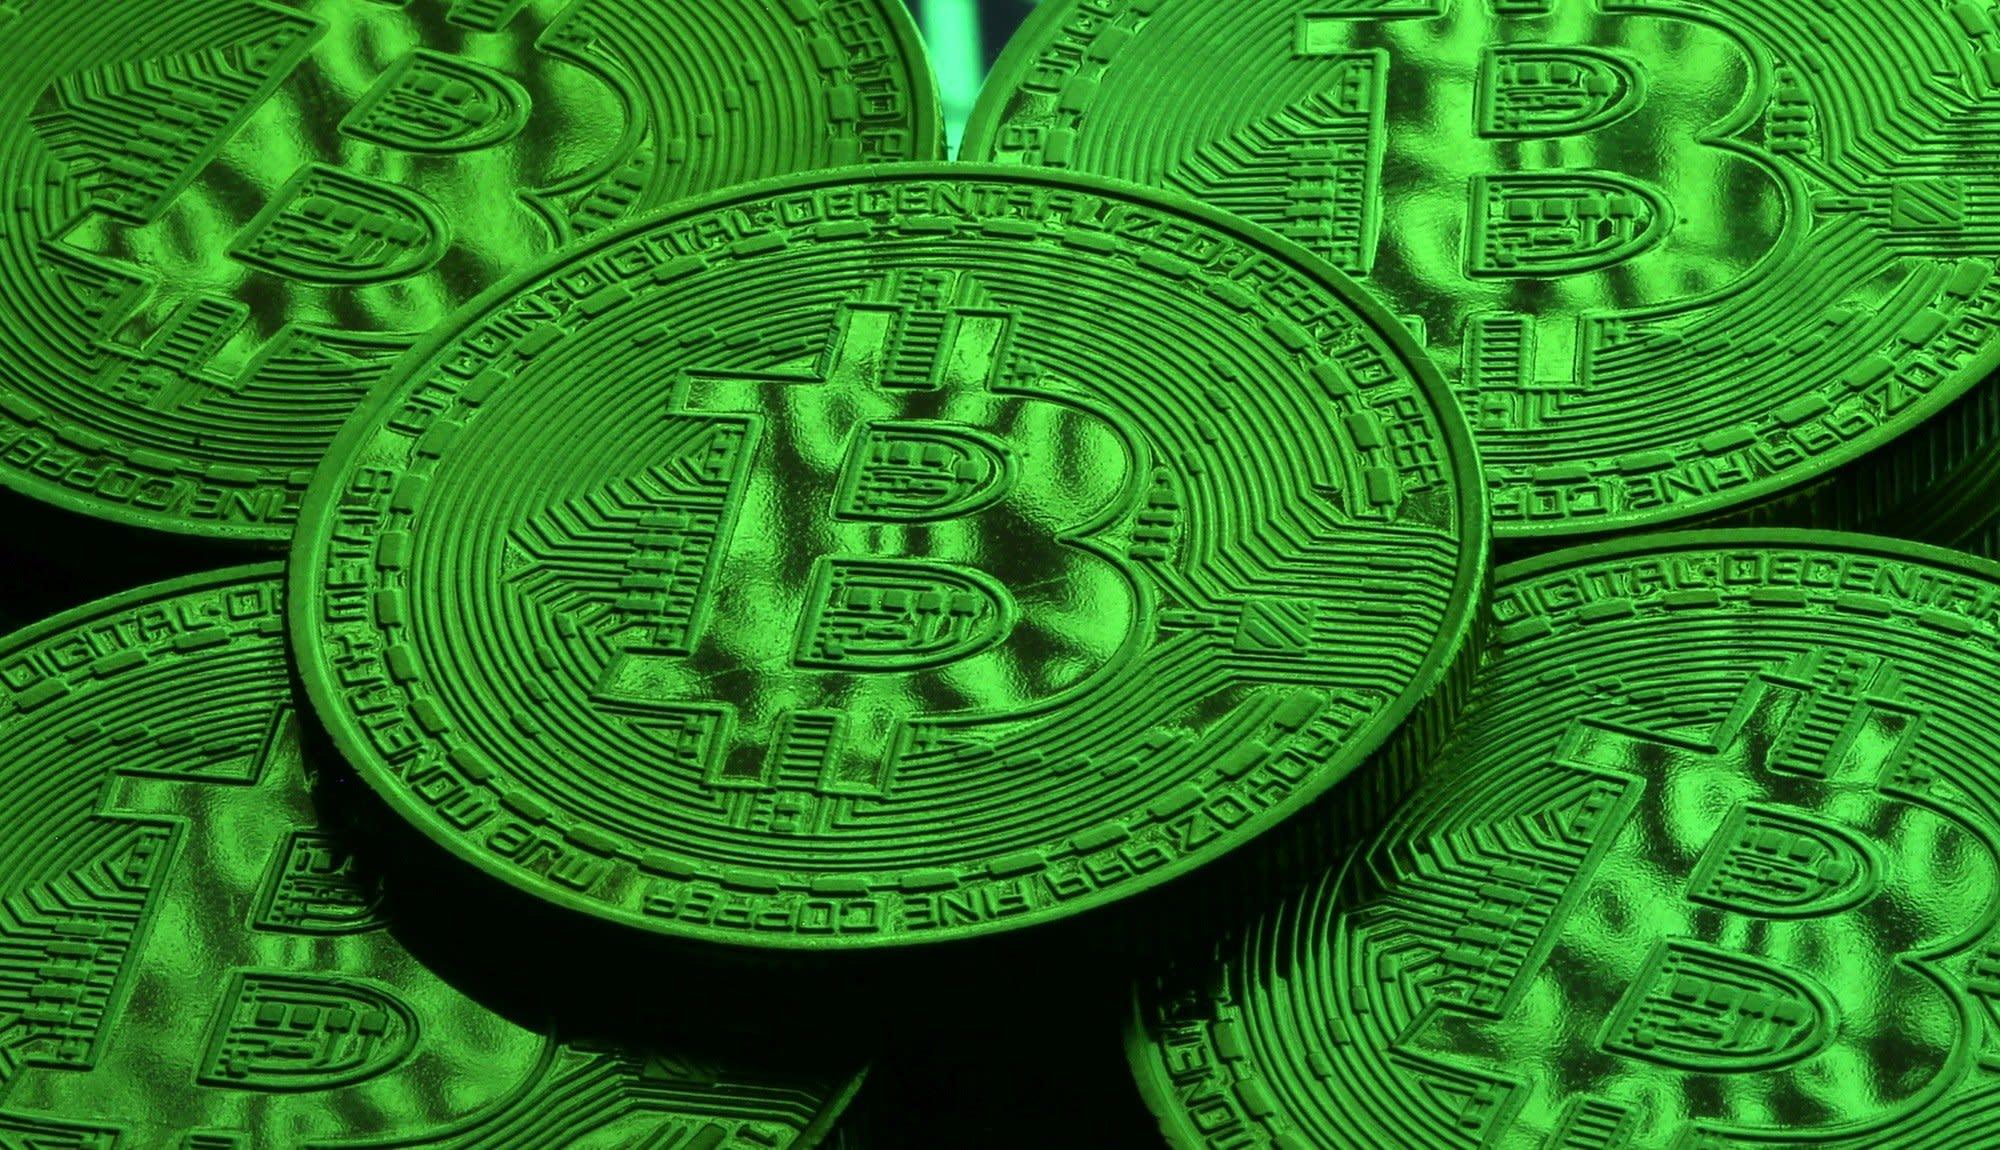 Fidelity Crypto Trading Creates 'Best News' Scenario for Surging Bitcoin Price